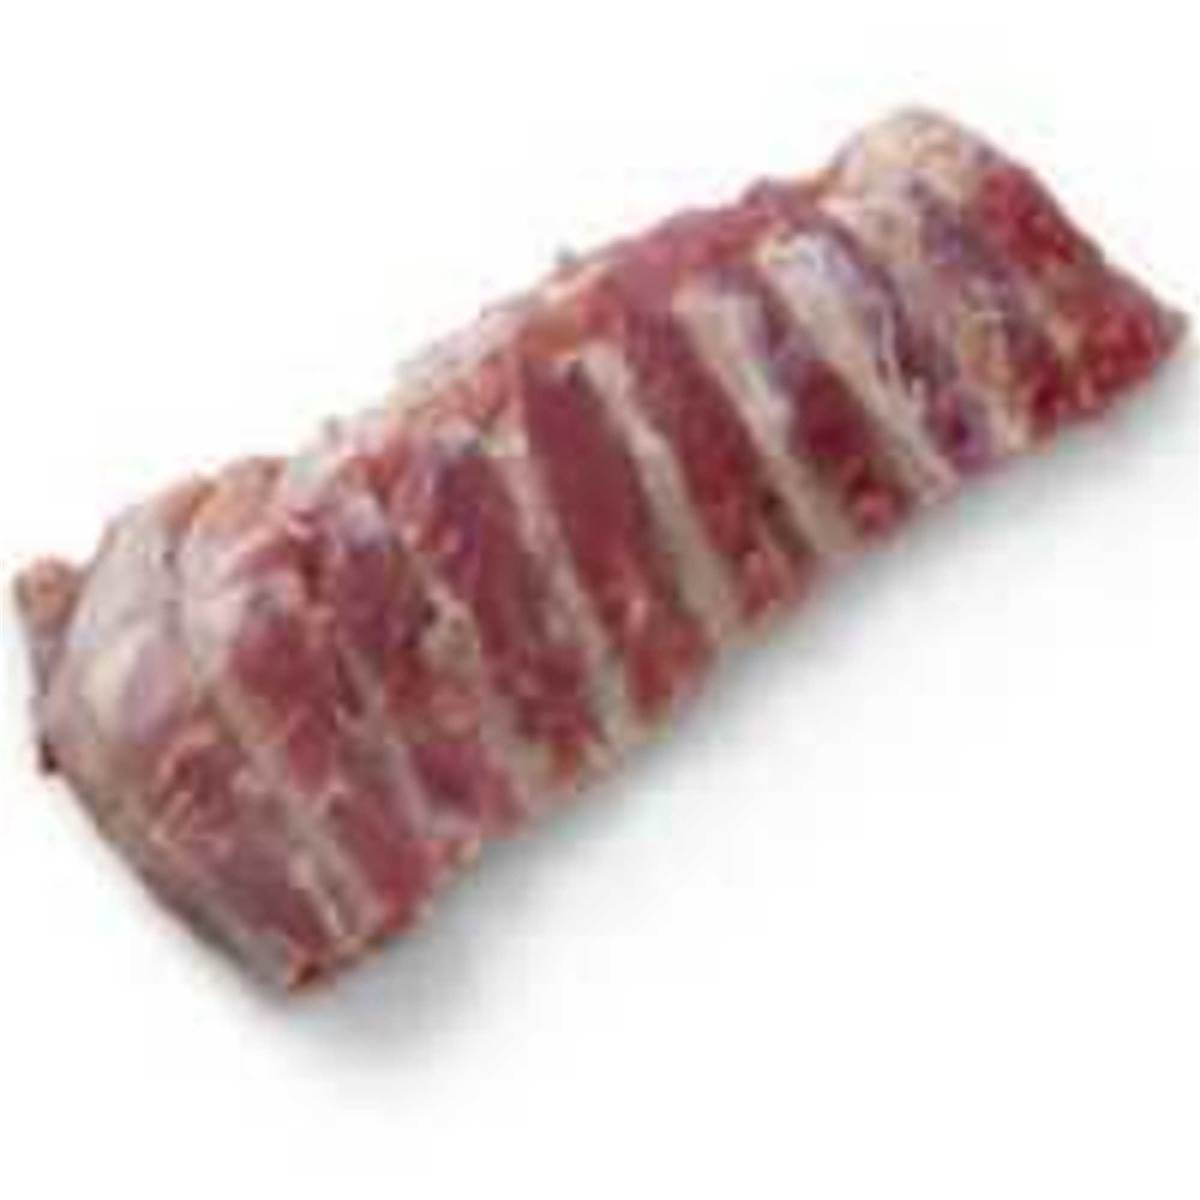 Porks Ribs Aussie Roast